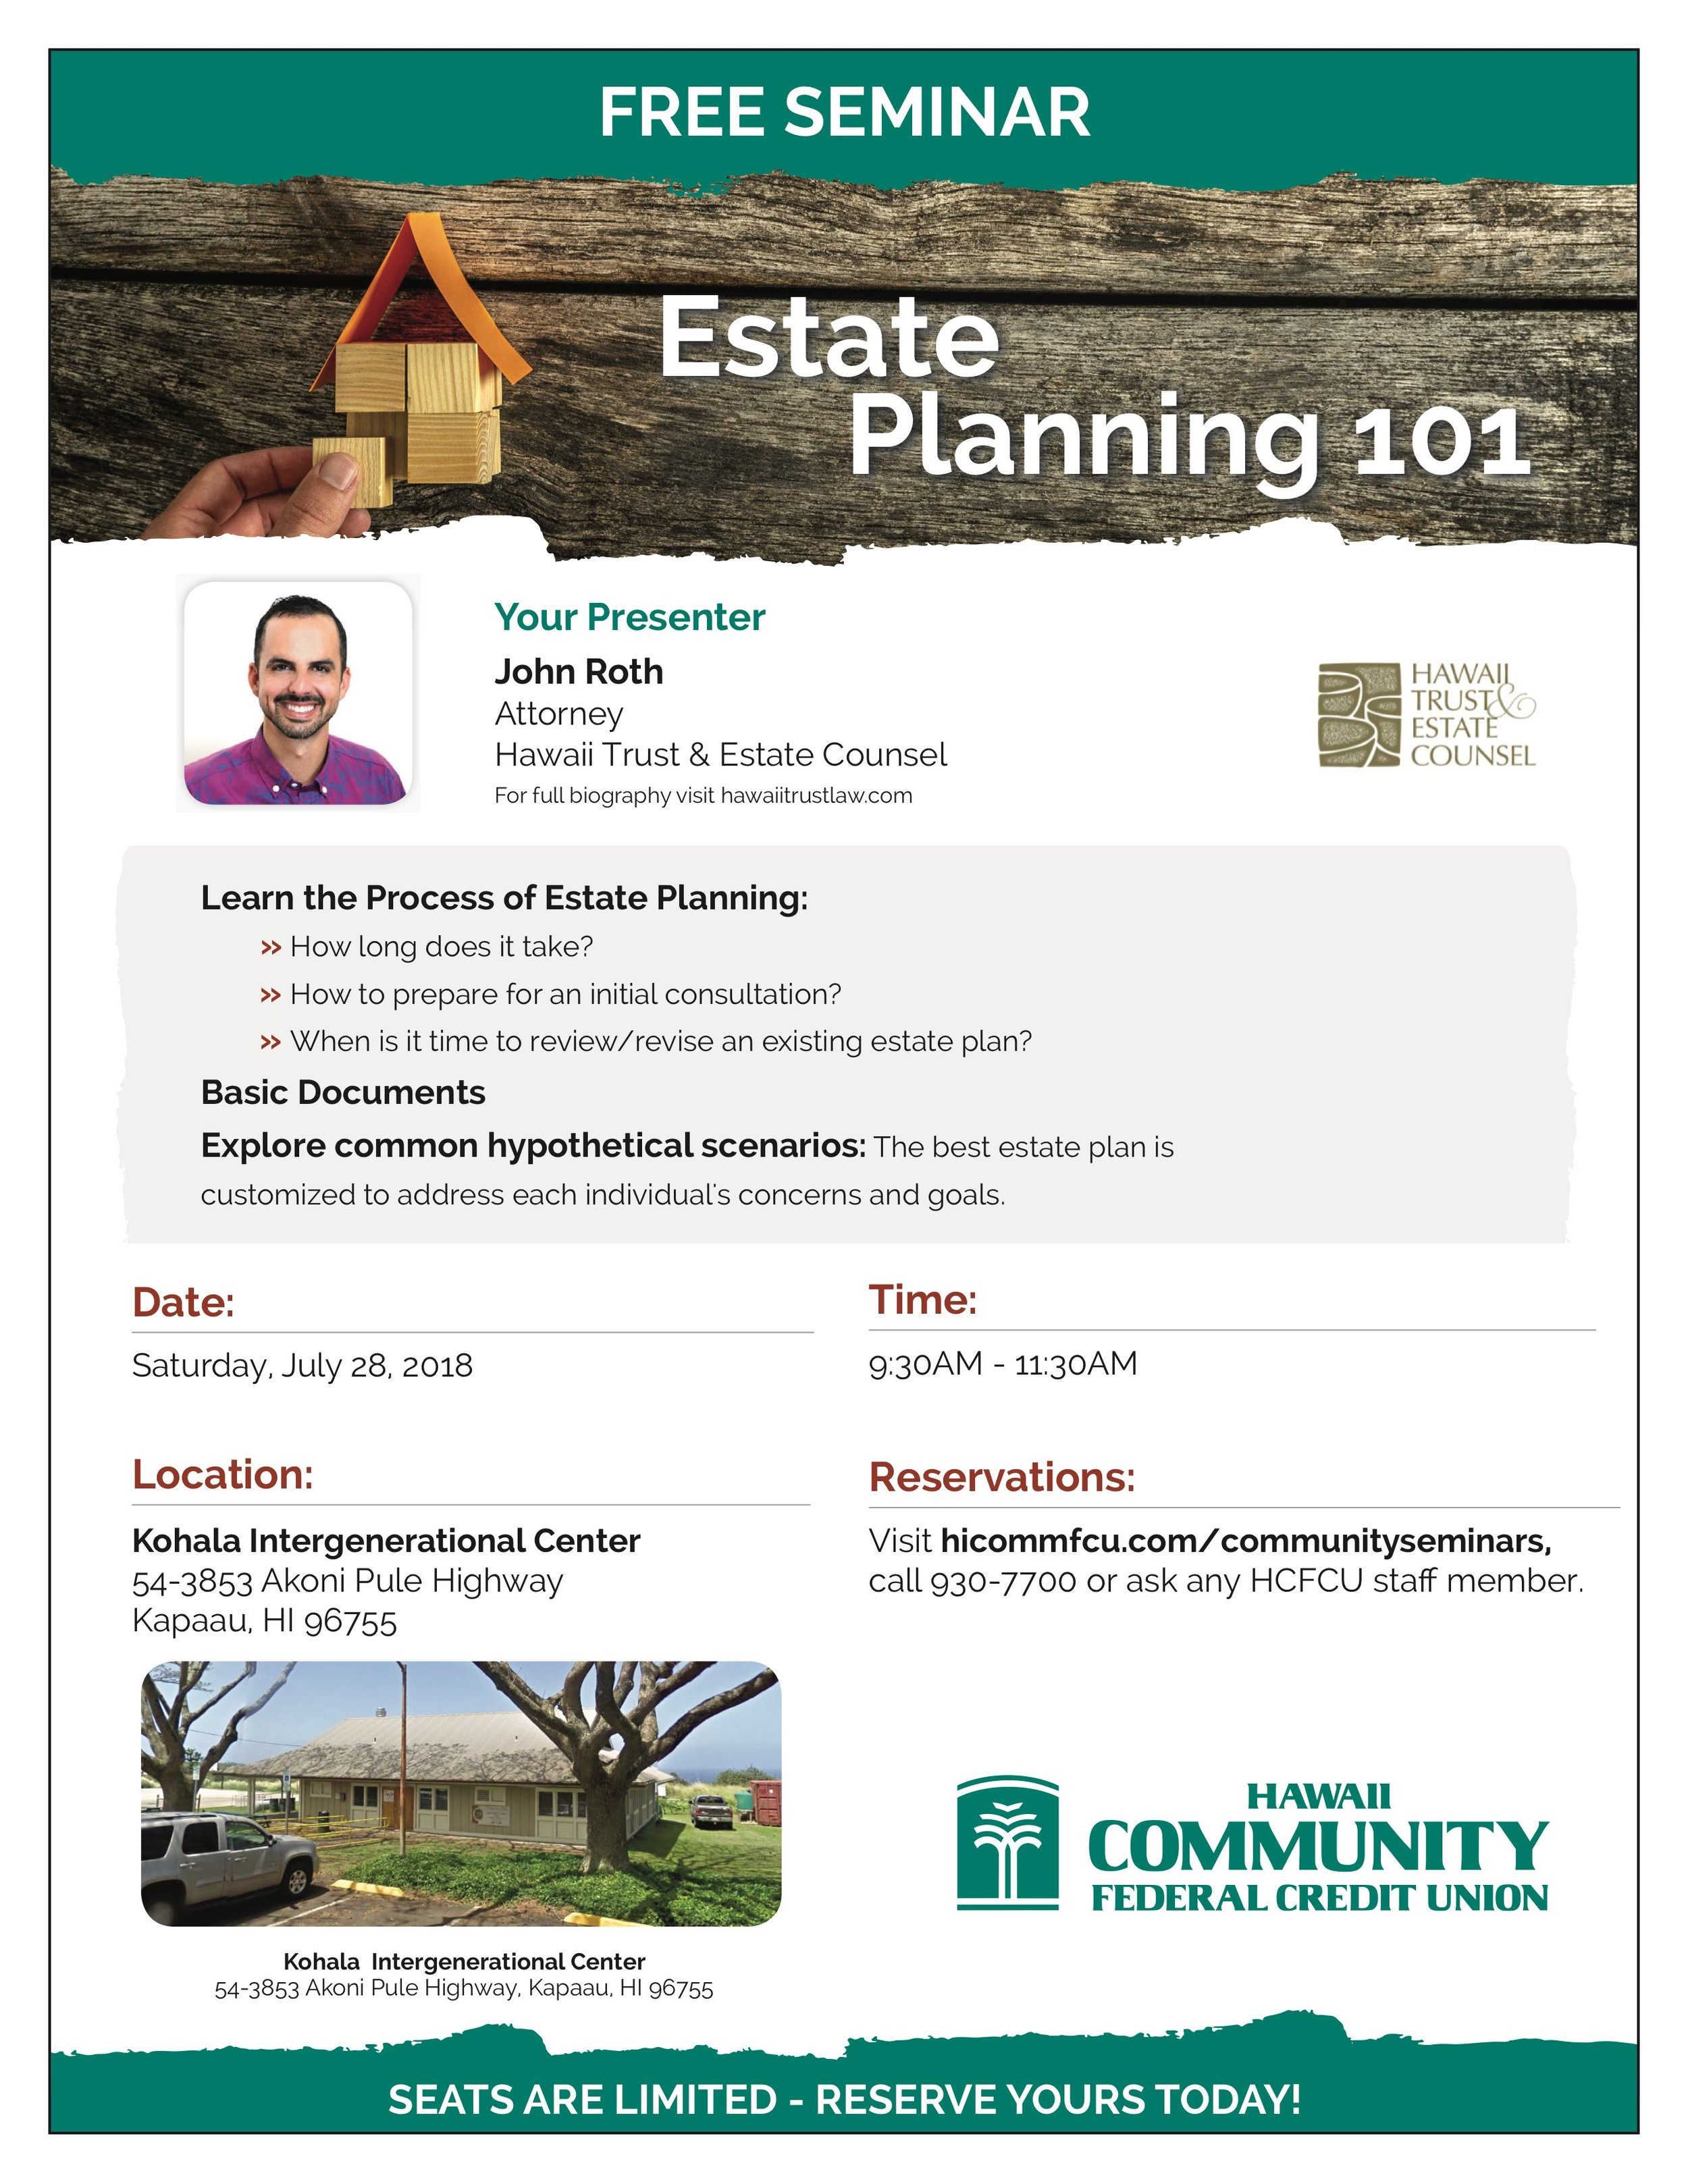 HCFCU_072818-EstatePlanning-Kohala - revised.jpg